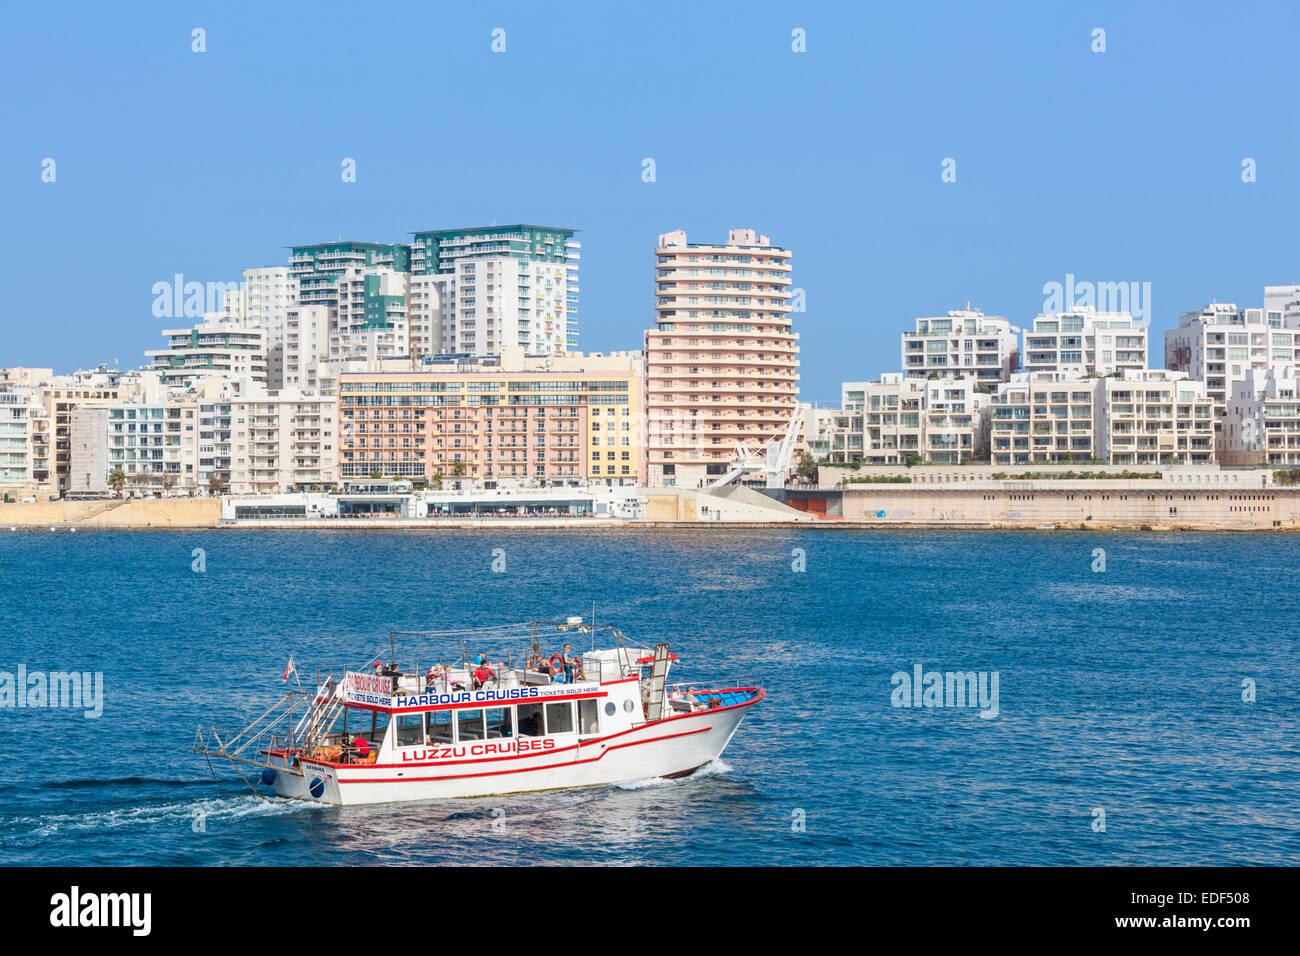 Tigne Point Sliema Skyline Marsamxett Harbour and Tourist boat Valletta Malta EU Europe - Stock Image